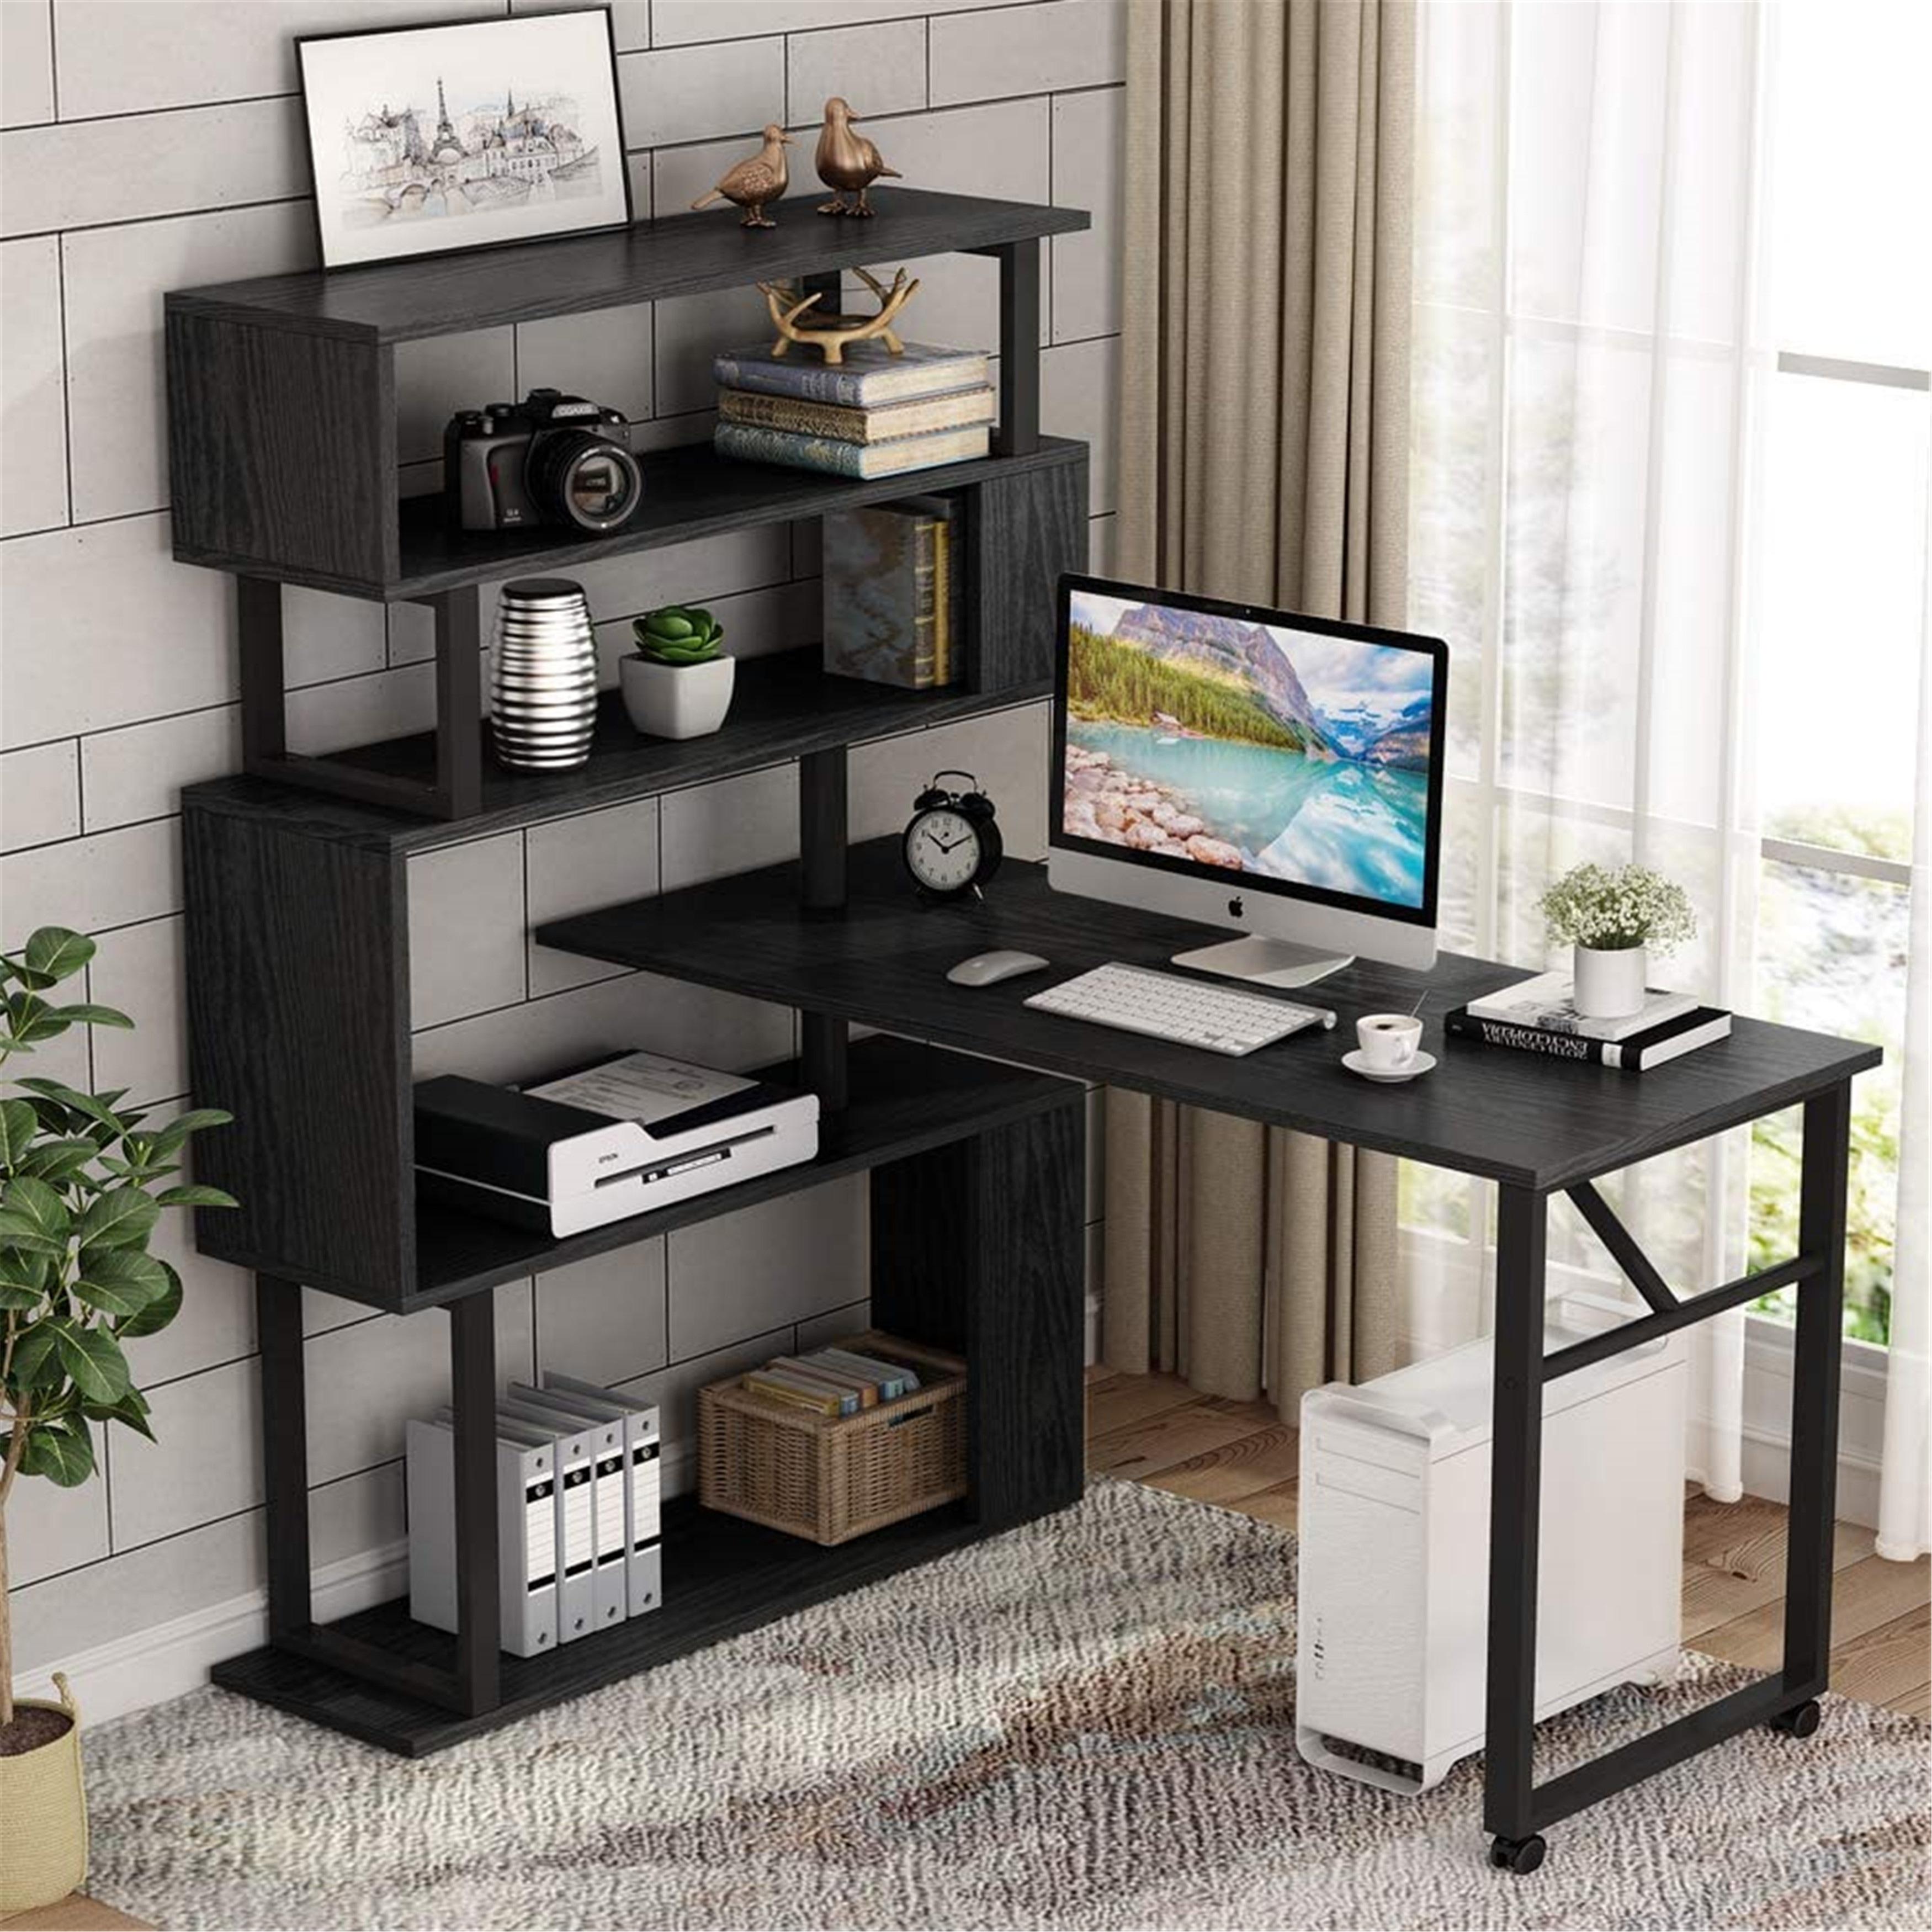 Rotating Computer Desk With 5 Shelves Bookshelf Overstock 31456371 Black